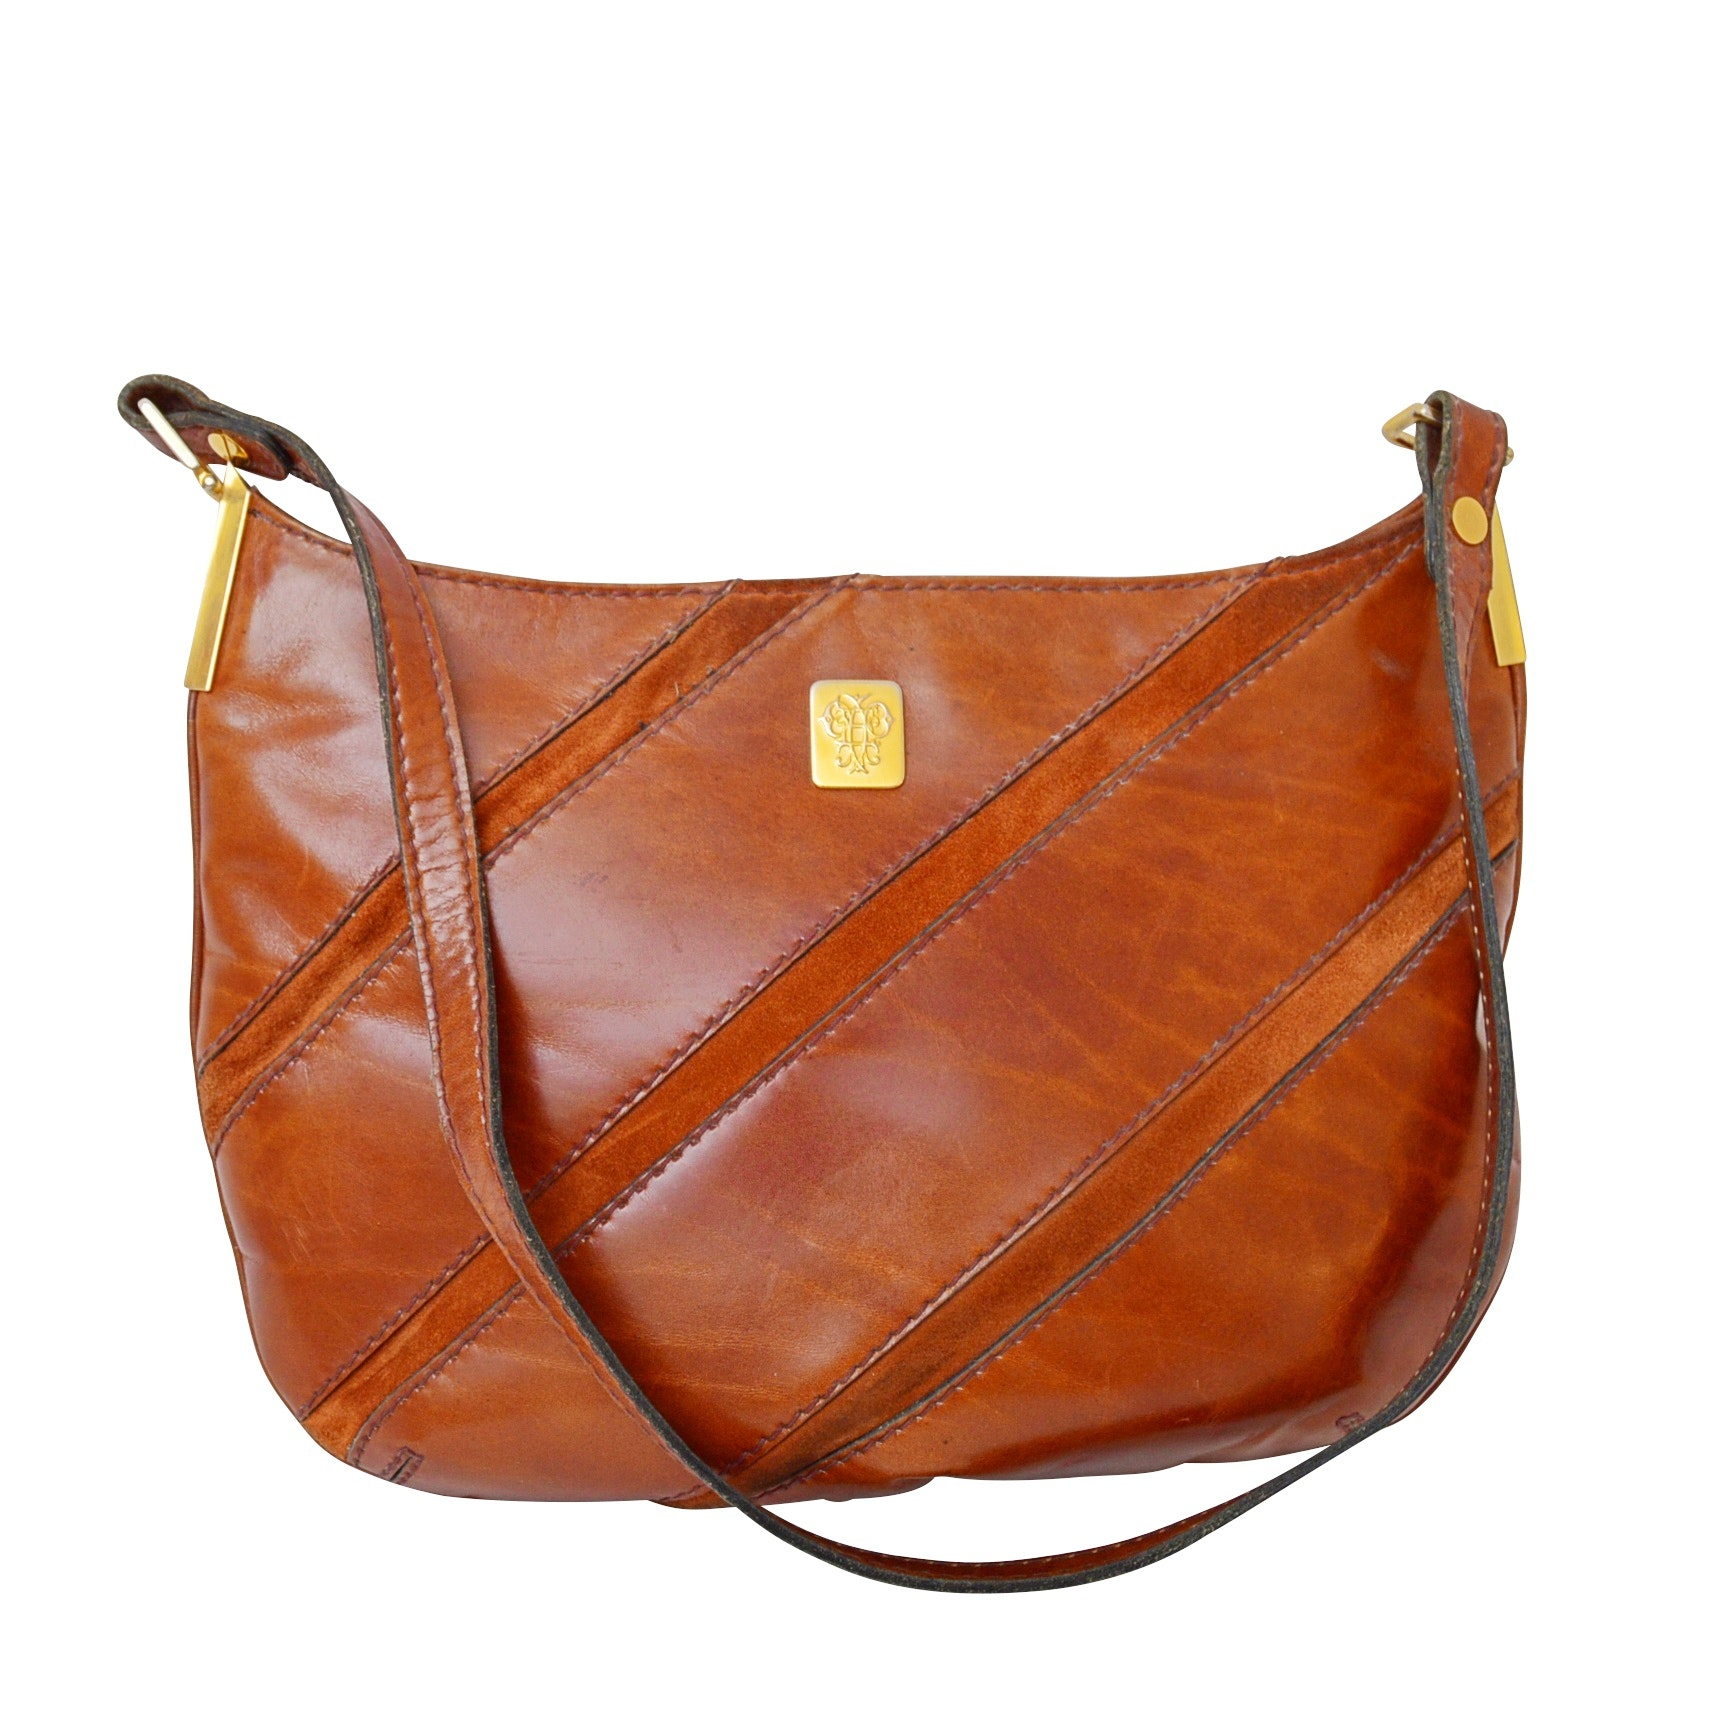 Pucci Leather Shoulder Bag